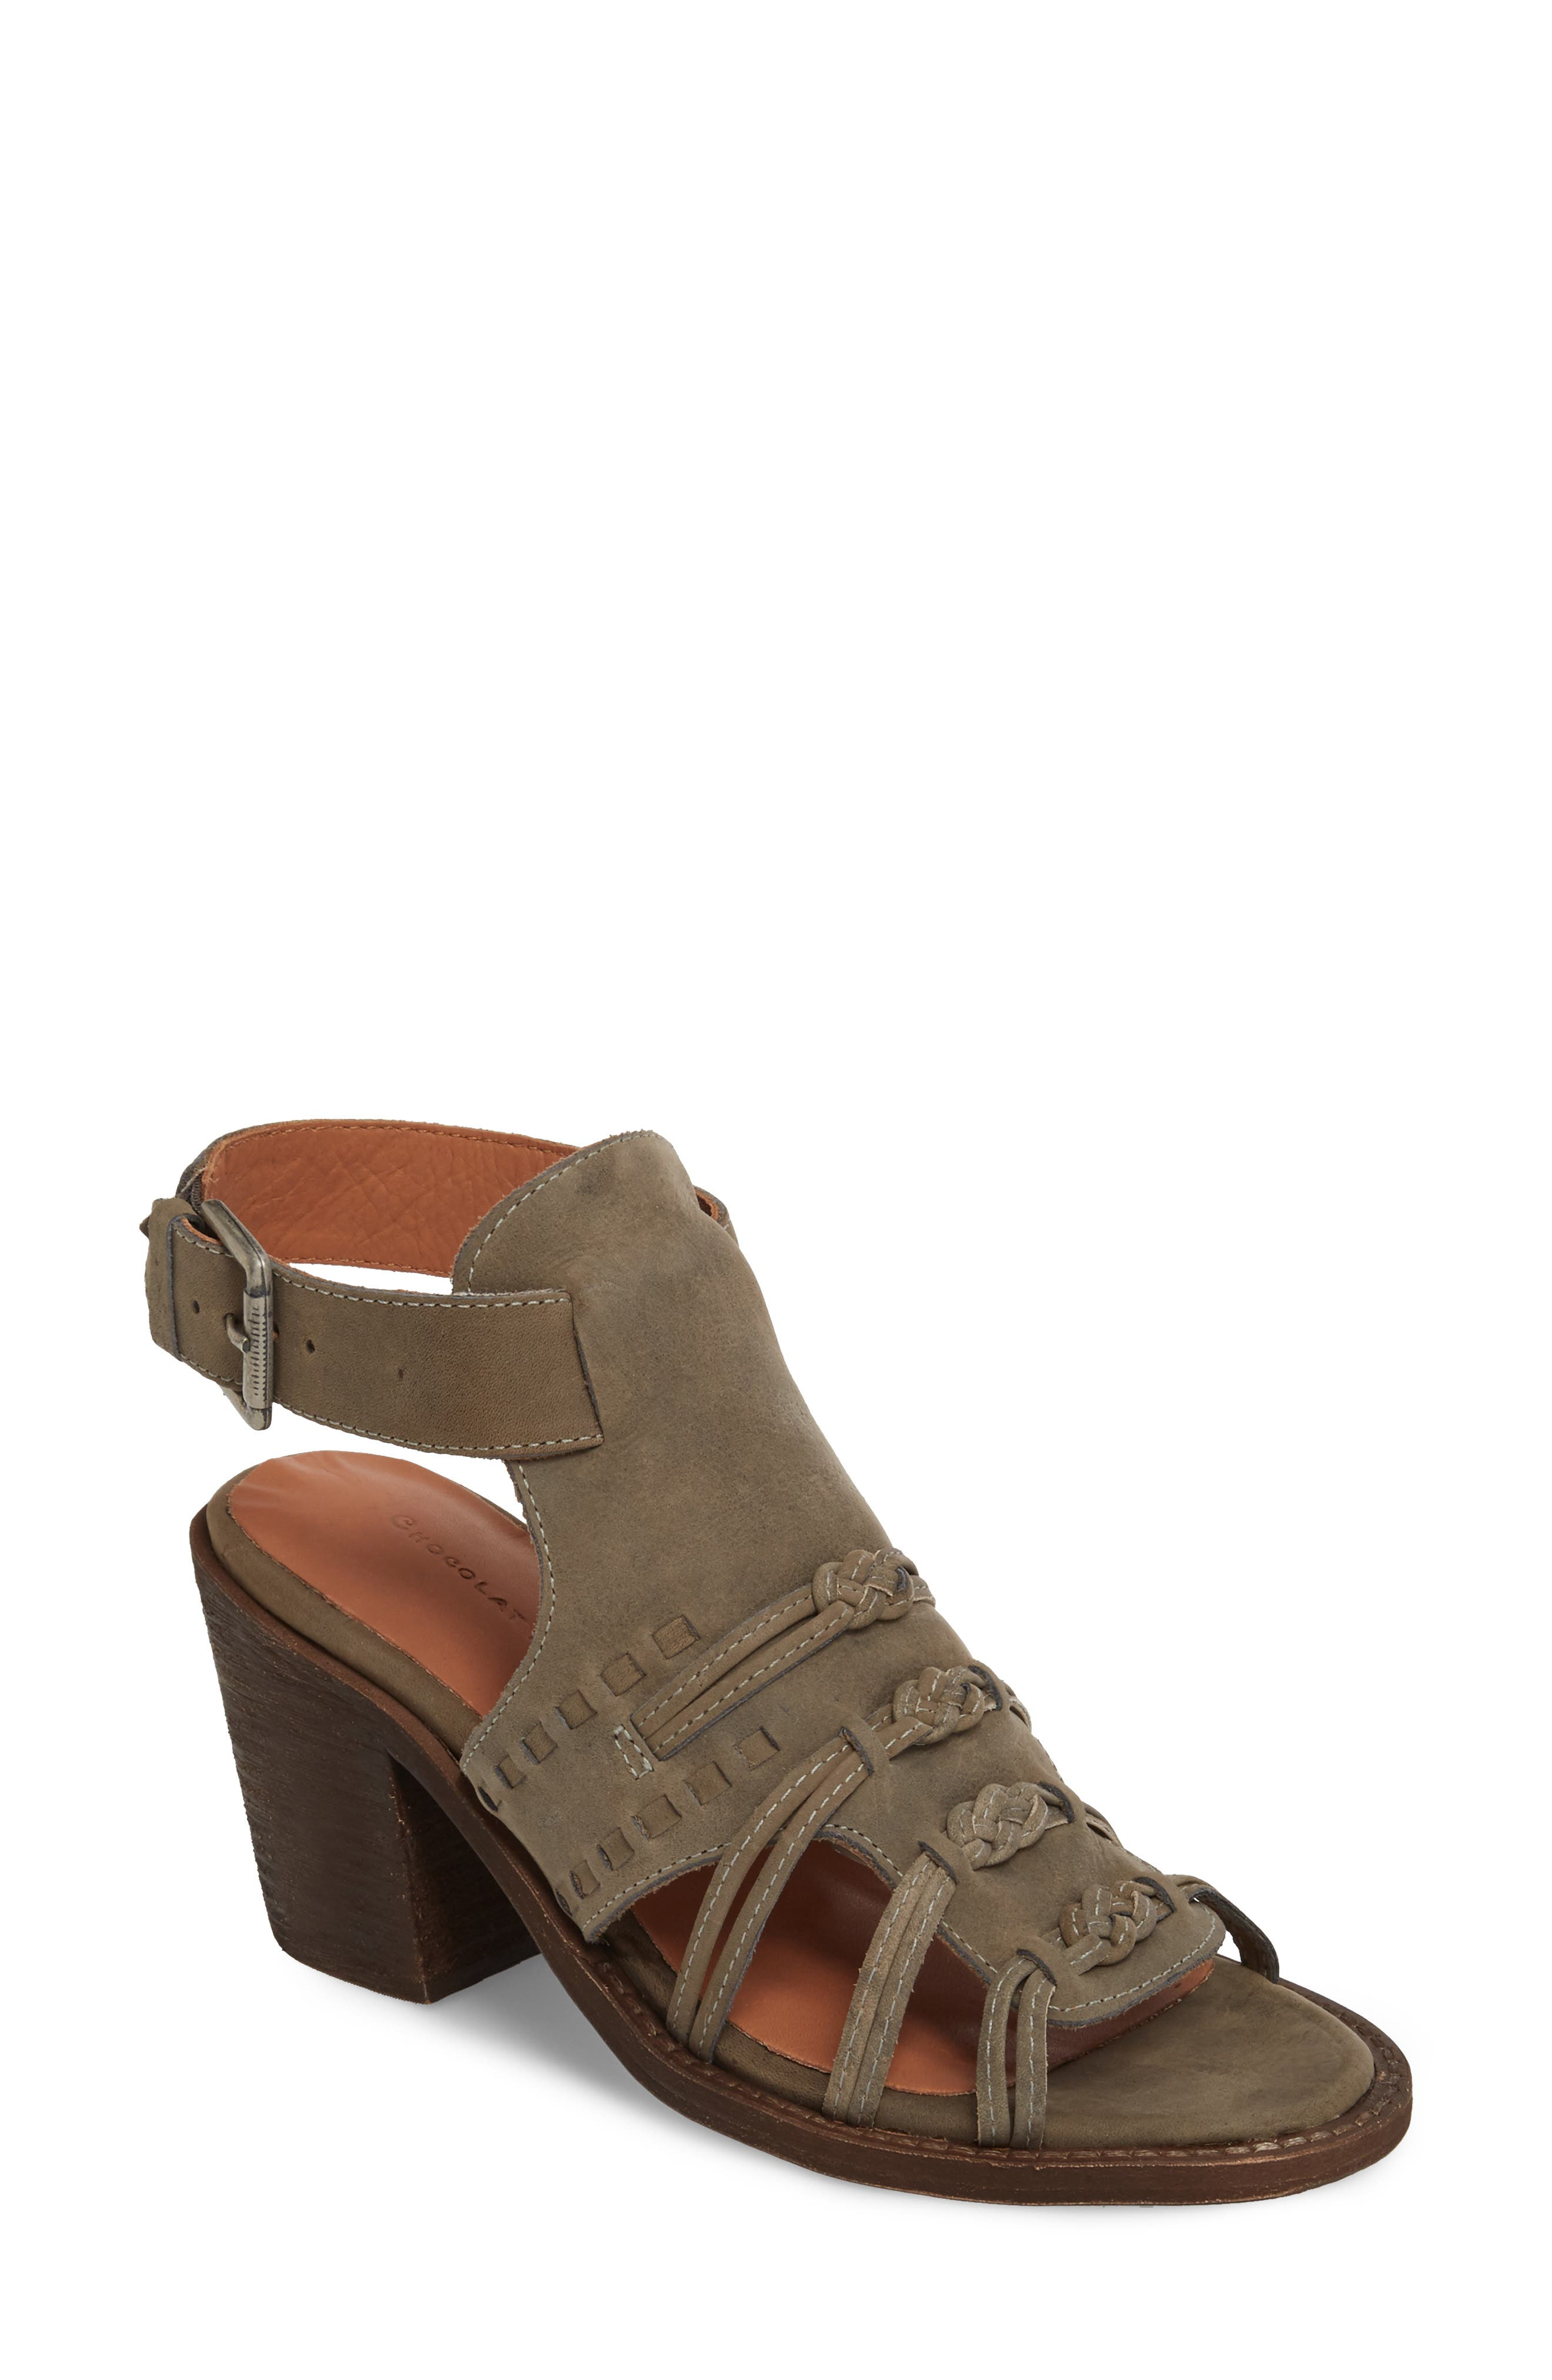 Volcano Sandal,                             Main thumbnail 1, color,                             Grey Leather